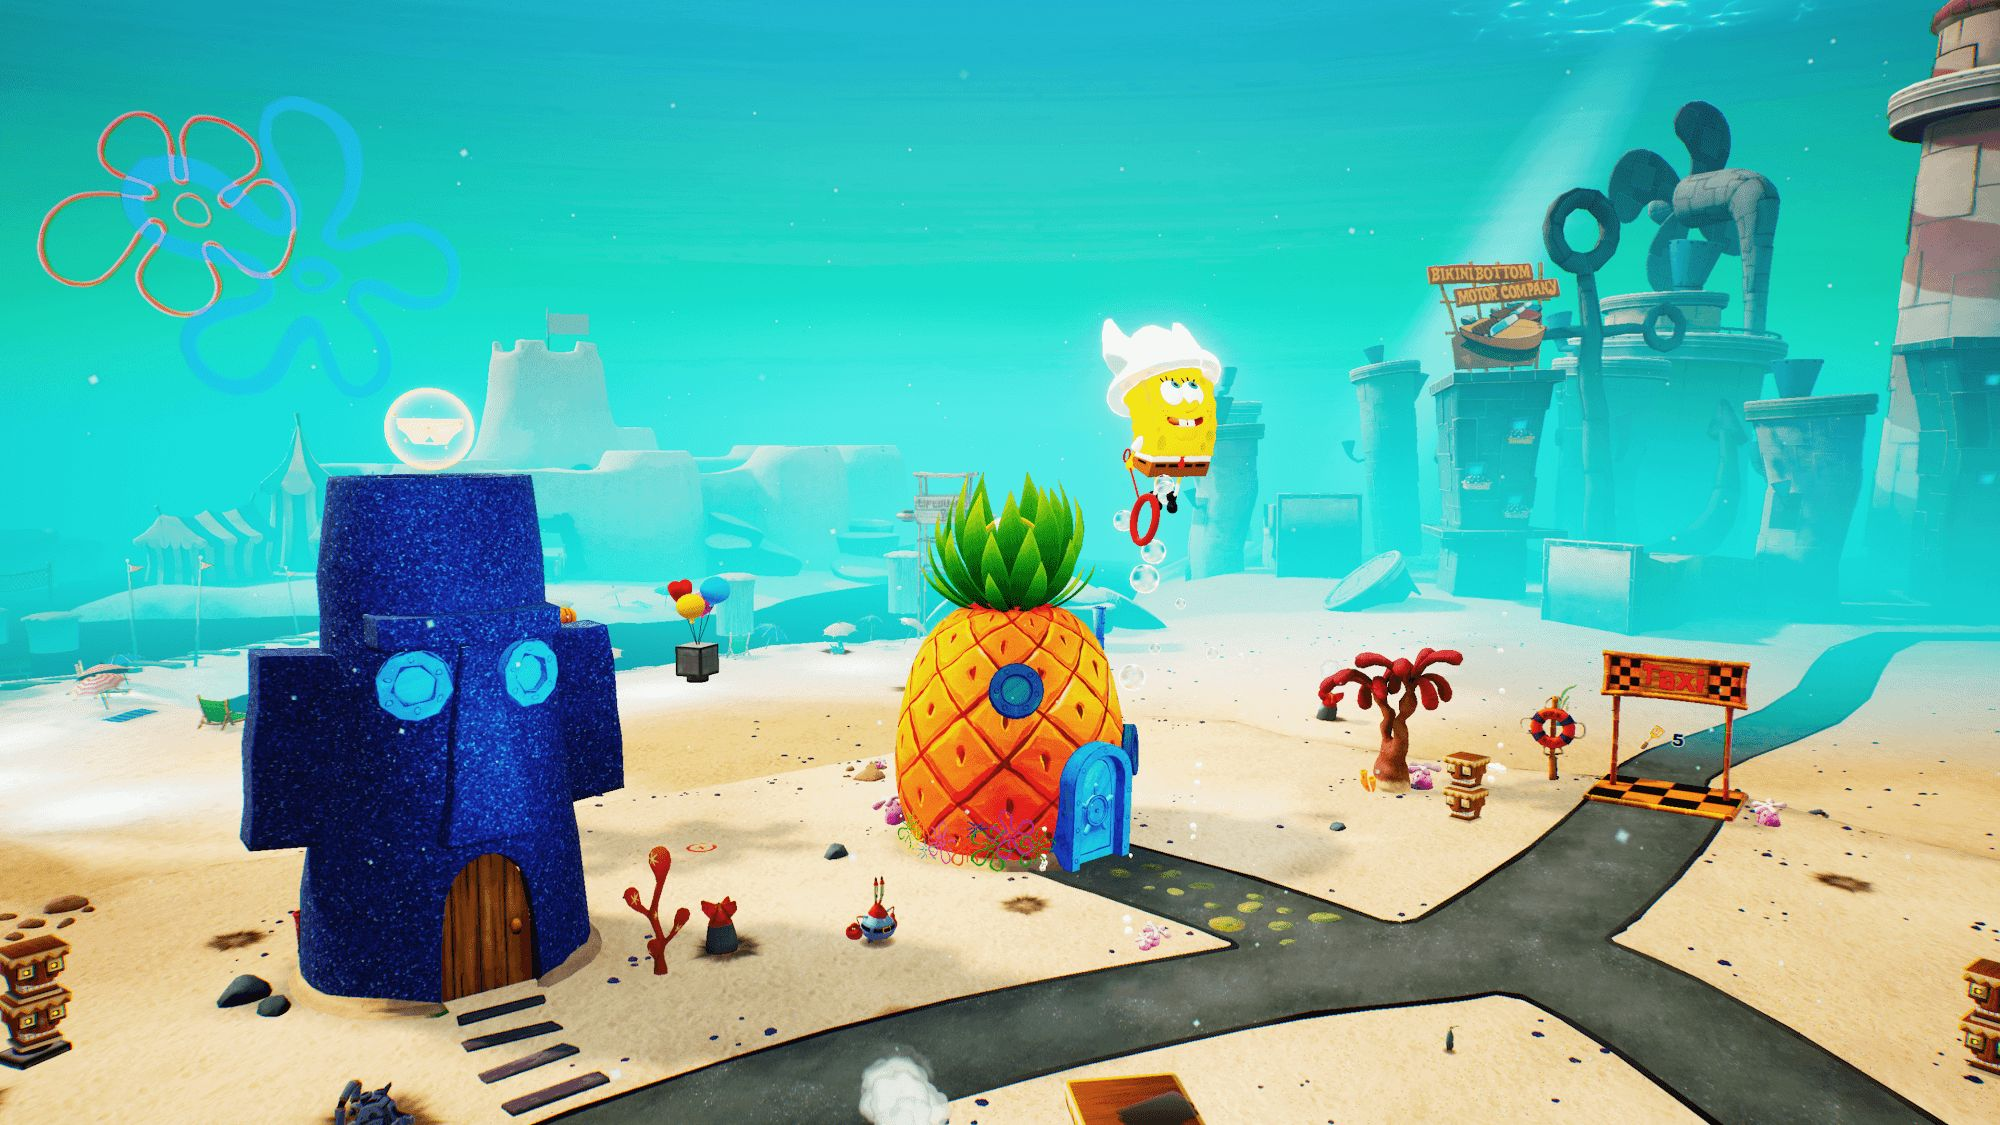 SpongeBob SquarePants: Battle for Bikini Bottom screenshot 1